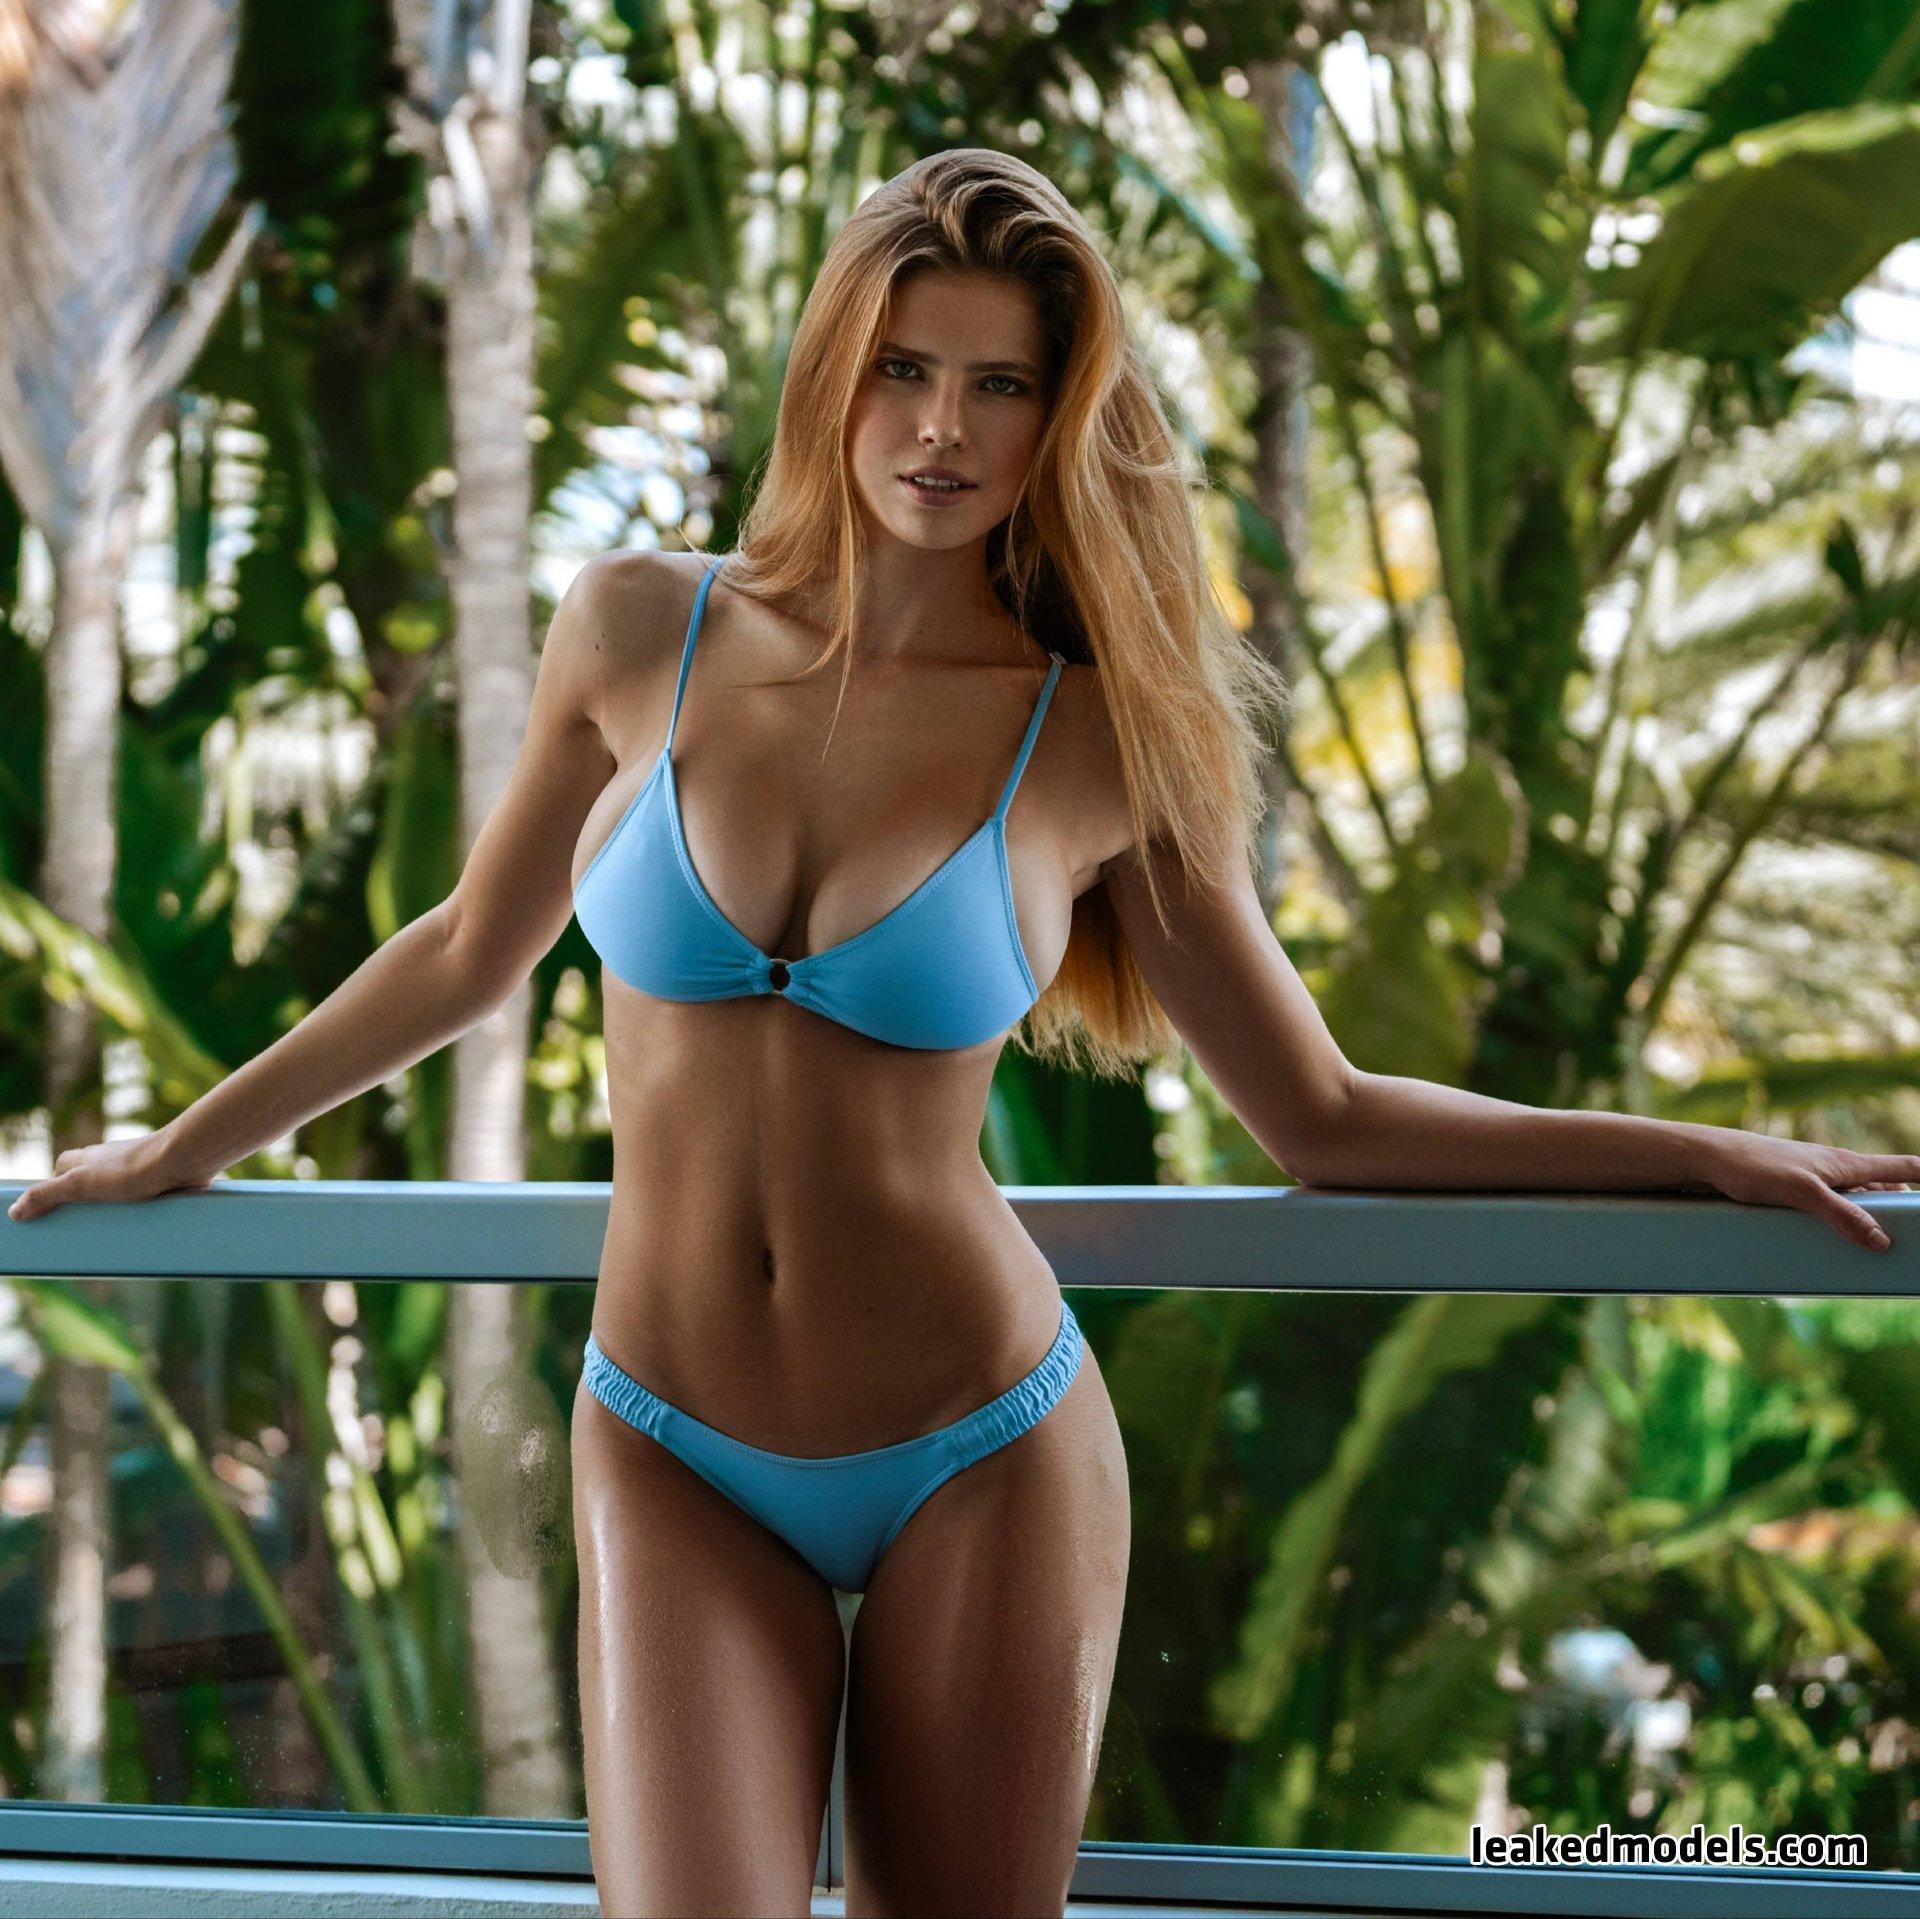 Emily Deyt Aysage – emilydeytaysage Instagram Nude Leaks (30 Photos)